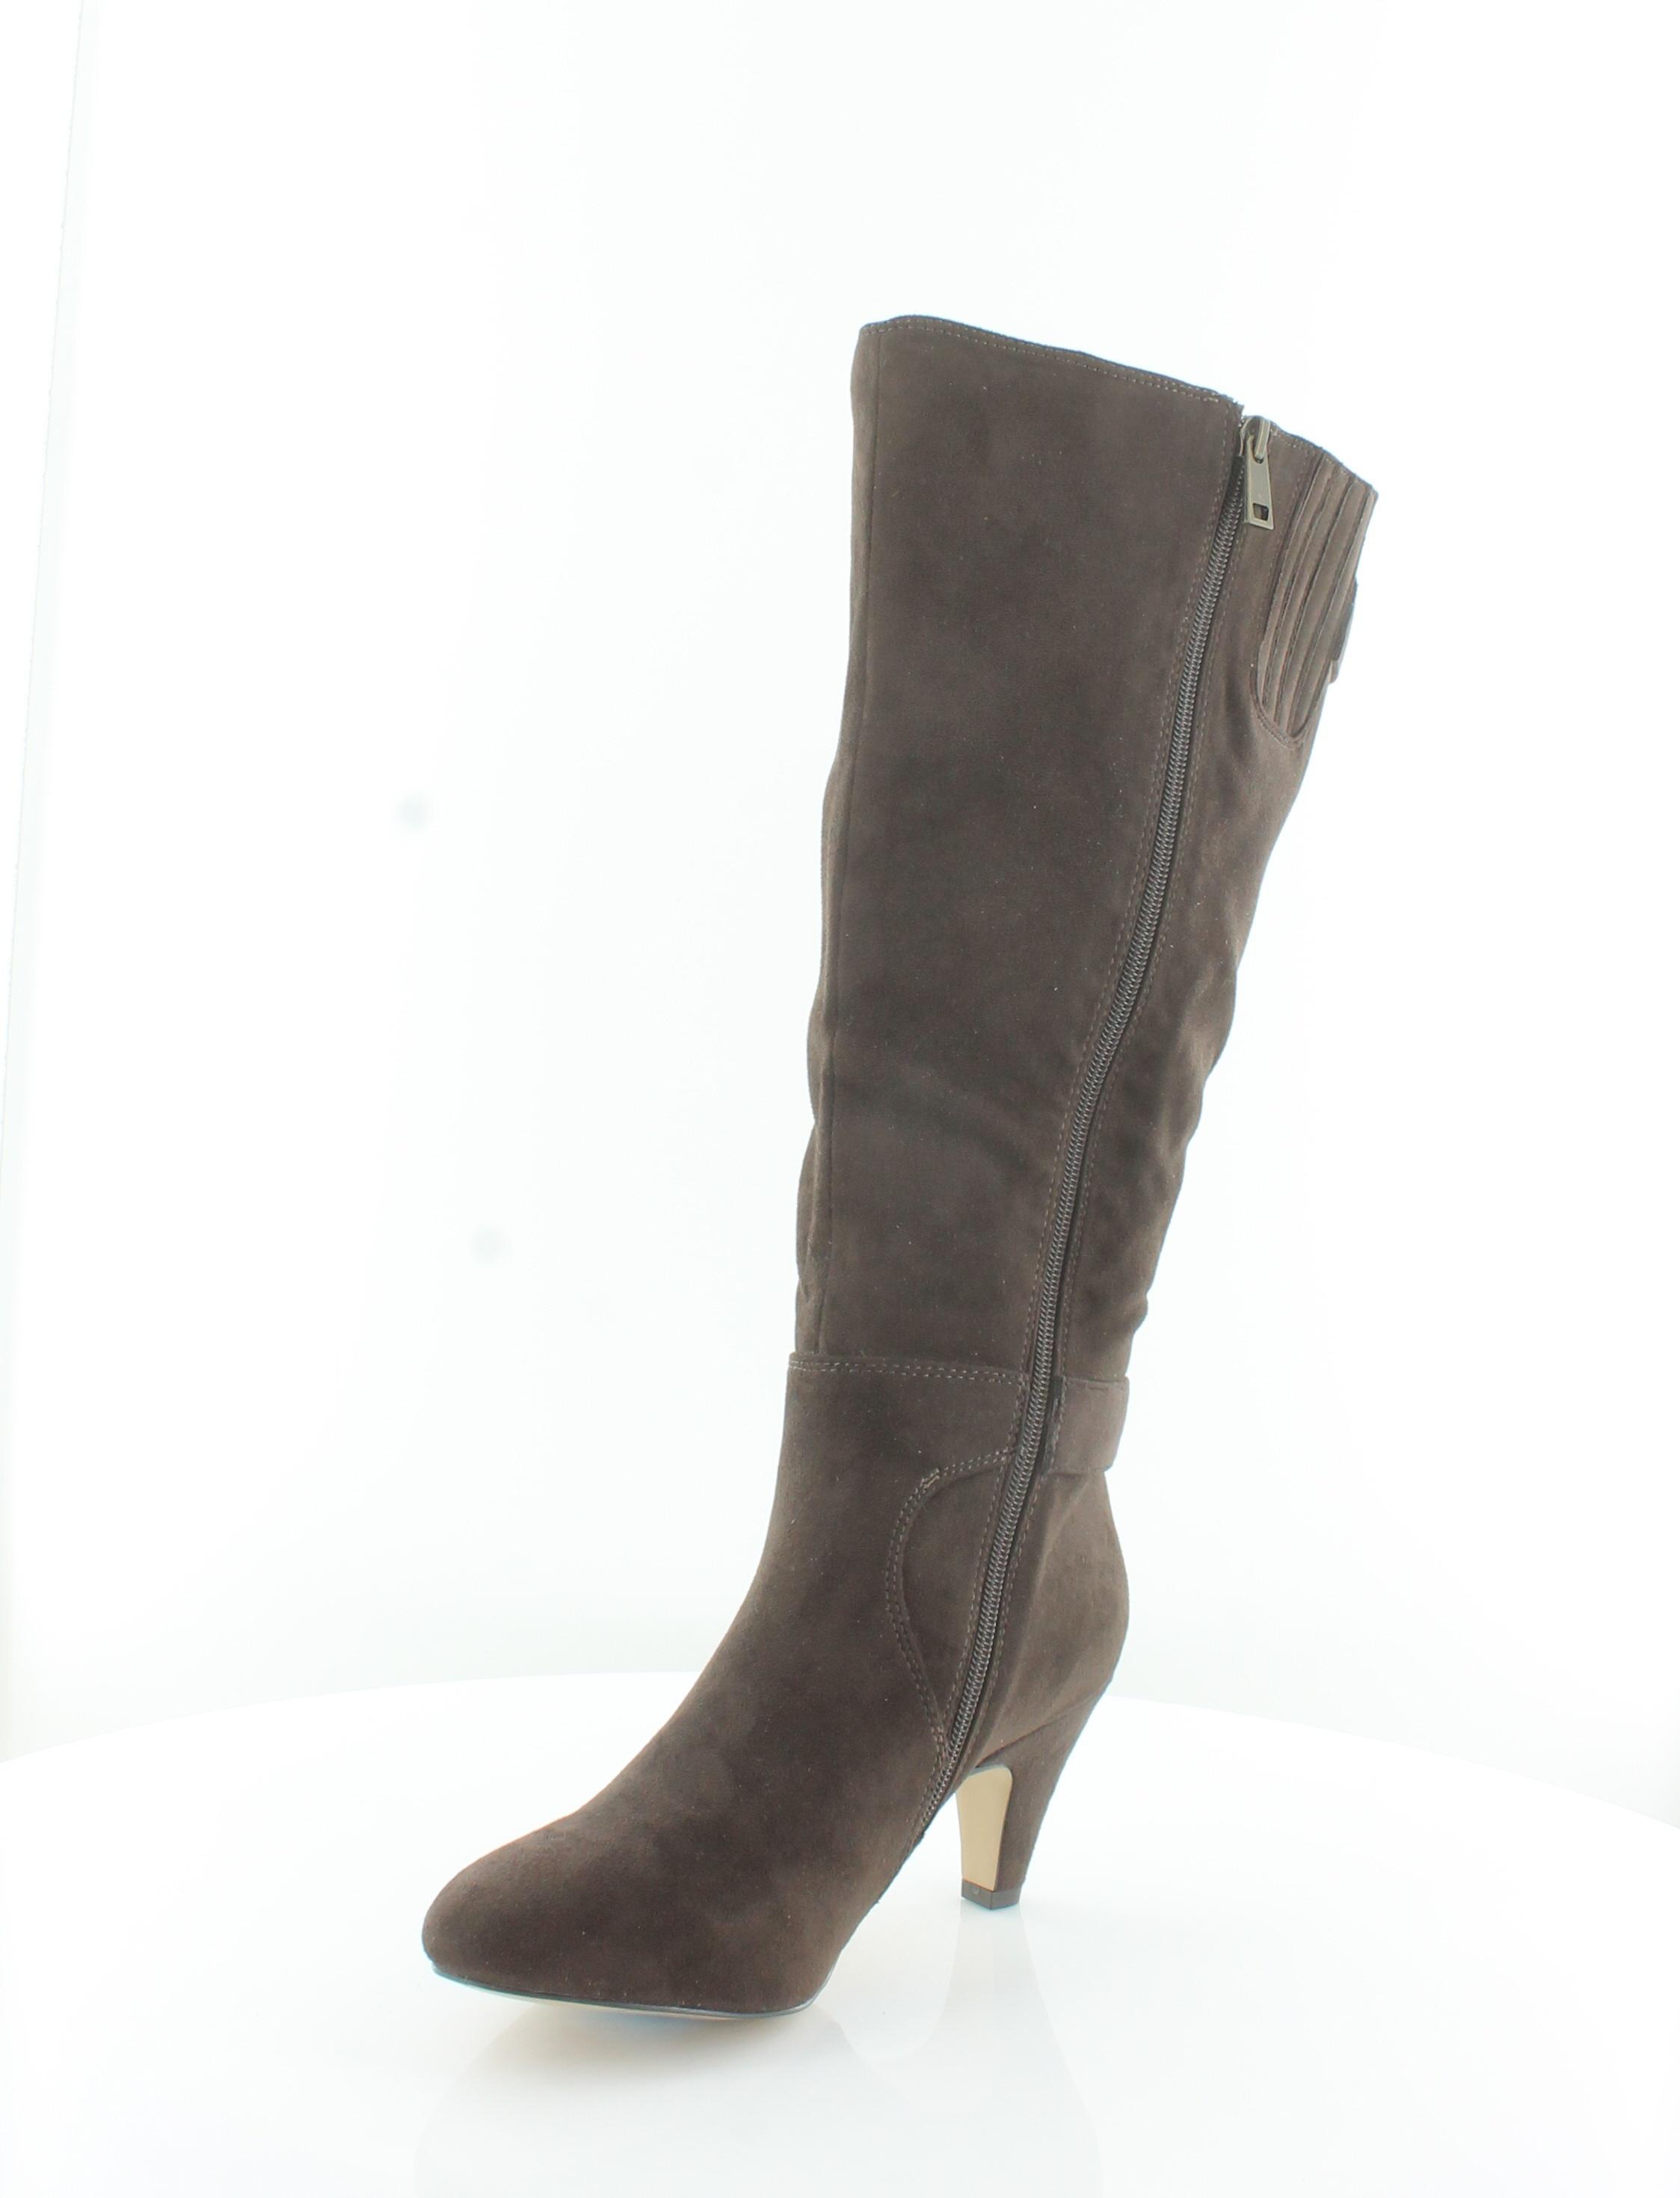 Bella Vita New Toni II braun braun braun damen schuhe Größe 7.5 M Stiefel MSRP  115 416c38